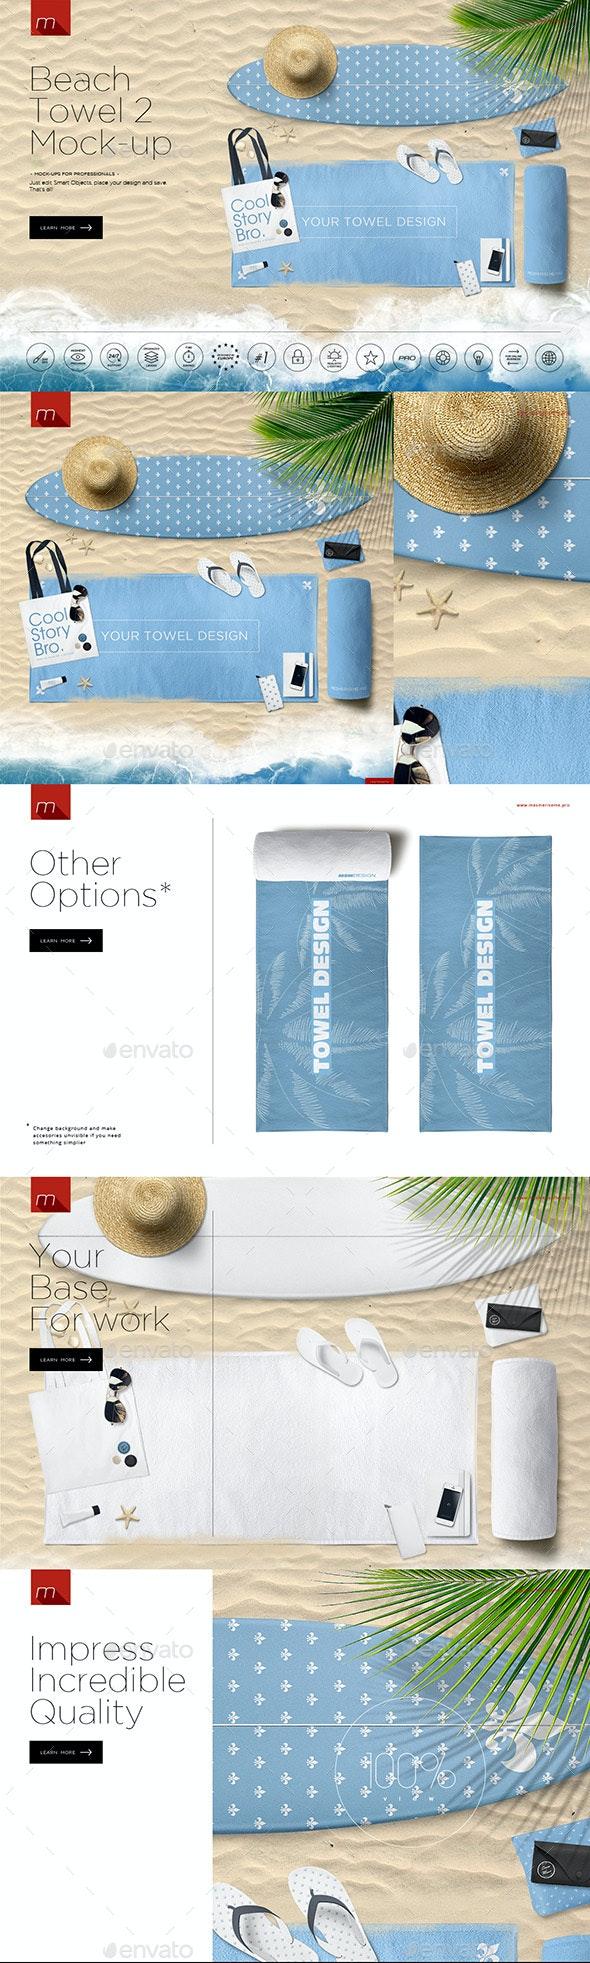 Beach Towel 2 Hero Image Mock-up - Product Mock-Ups Graphics